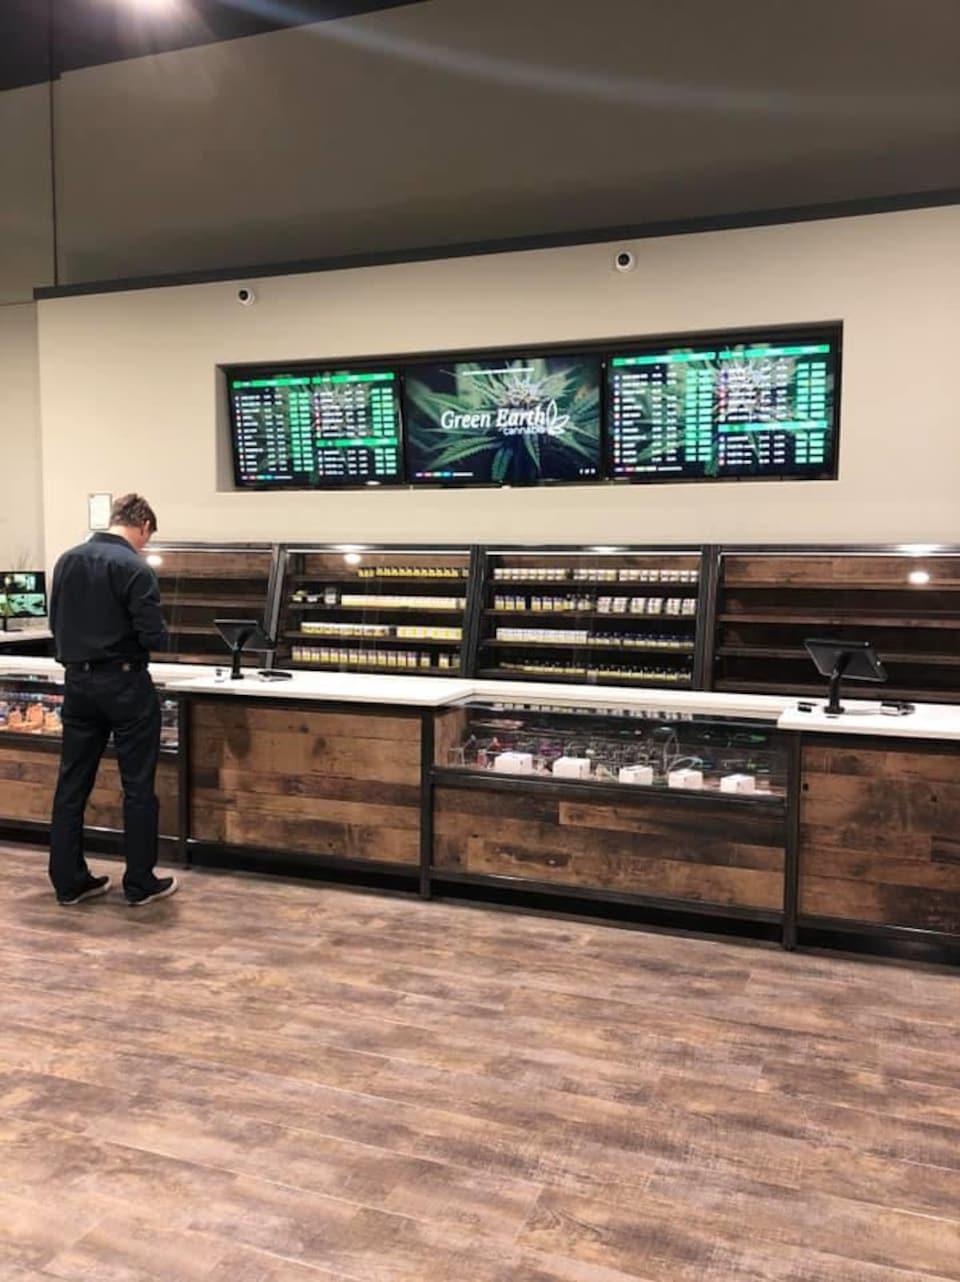 Un client regarde des produits de marijuana pendant qu'il est debout devant un comptoir de la boutique Green Earth Cannabis à Calgary